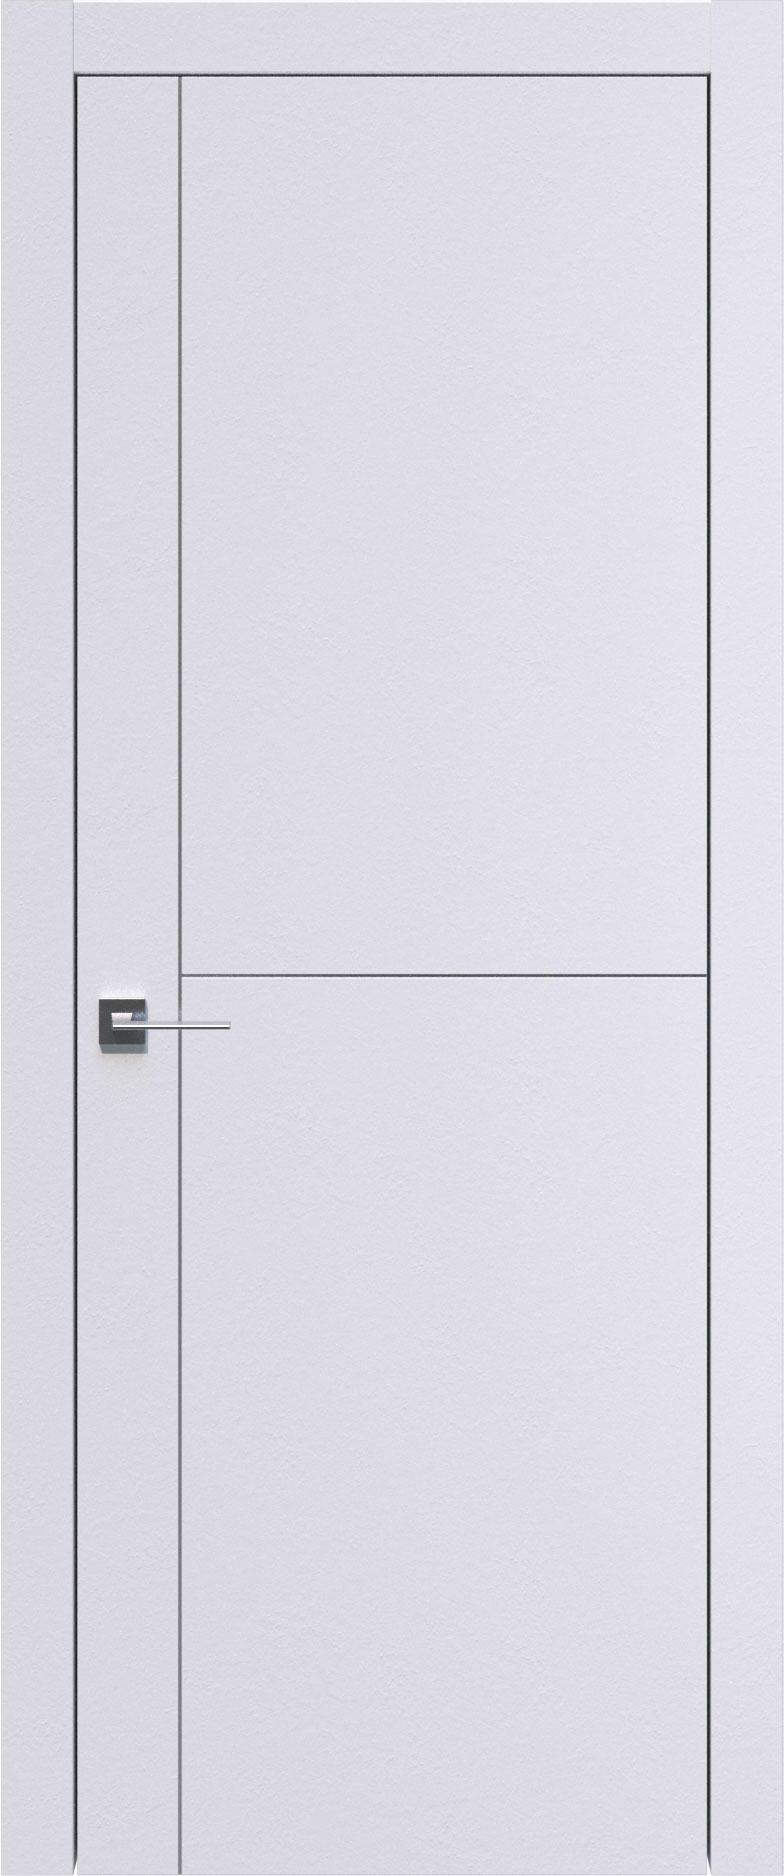 Tivoli Е-3 цвет - Арктик белый Без стекла (ДГ)